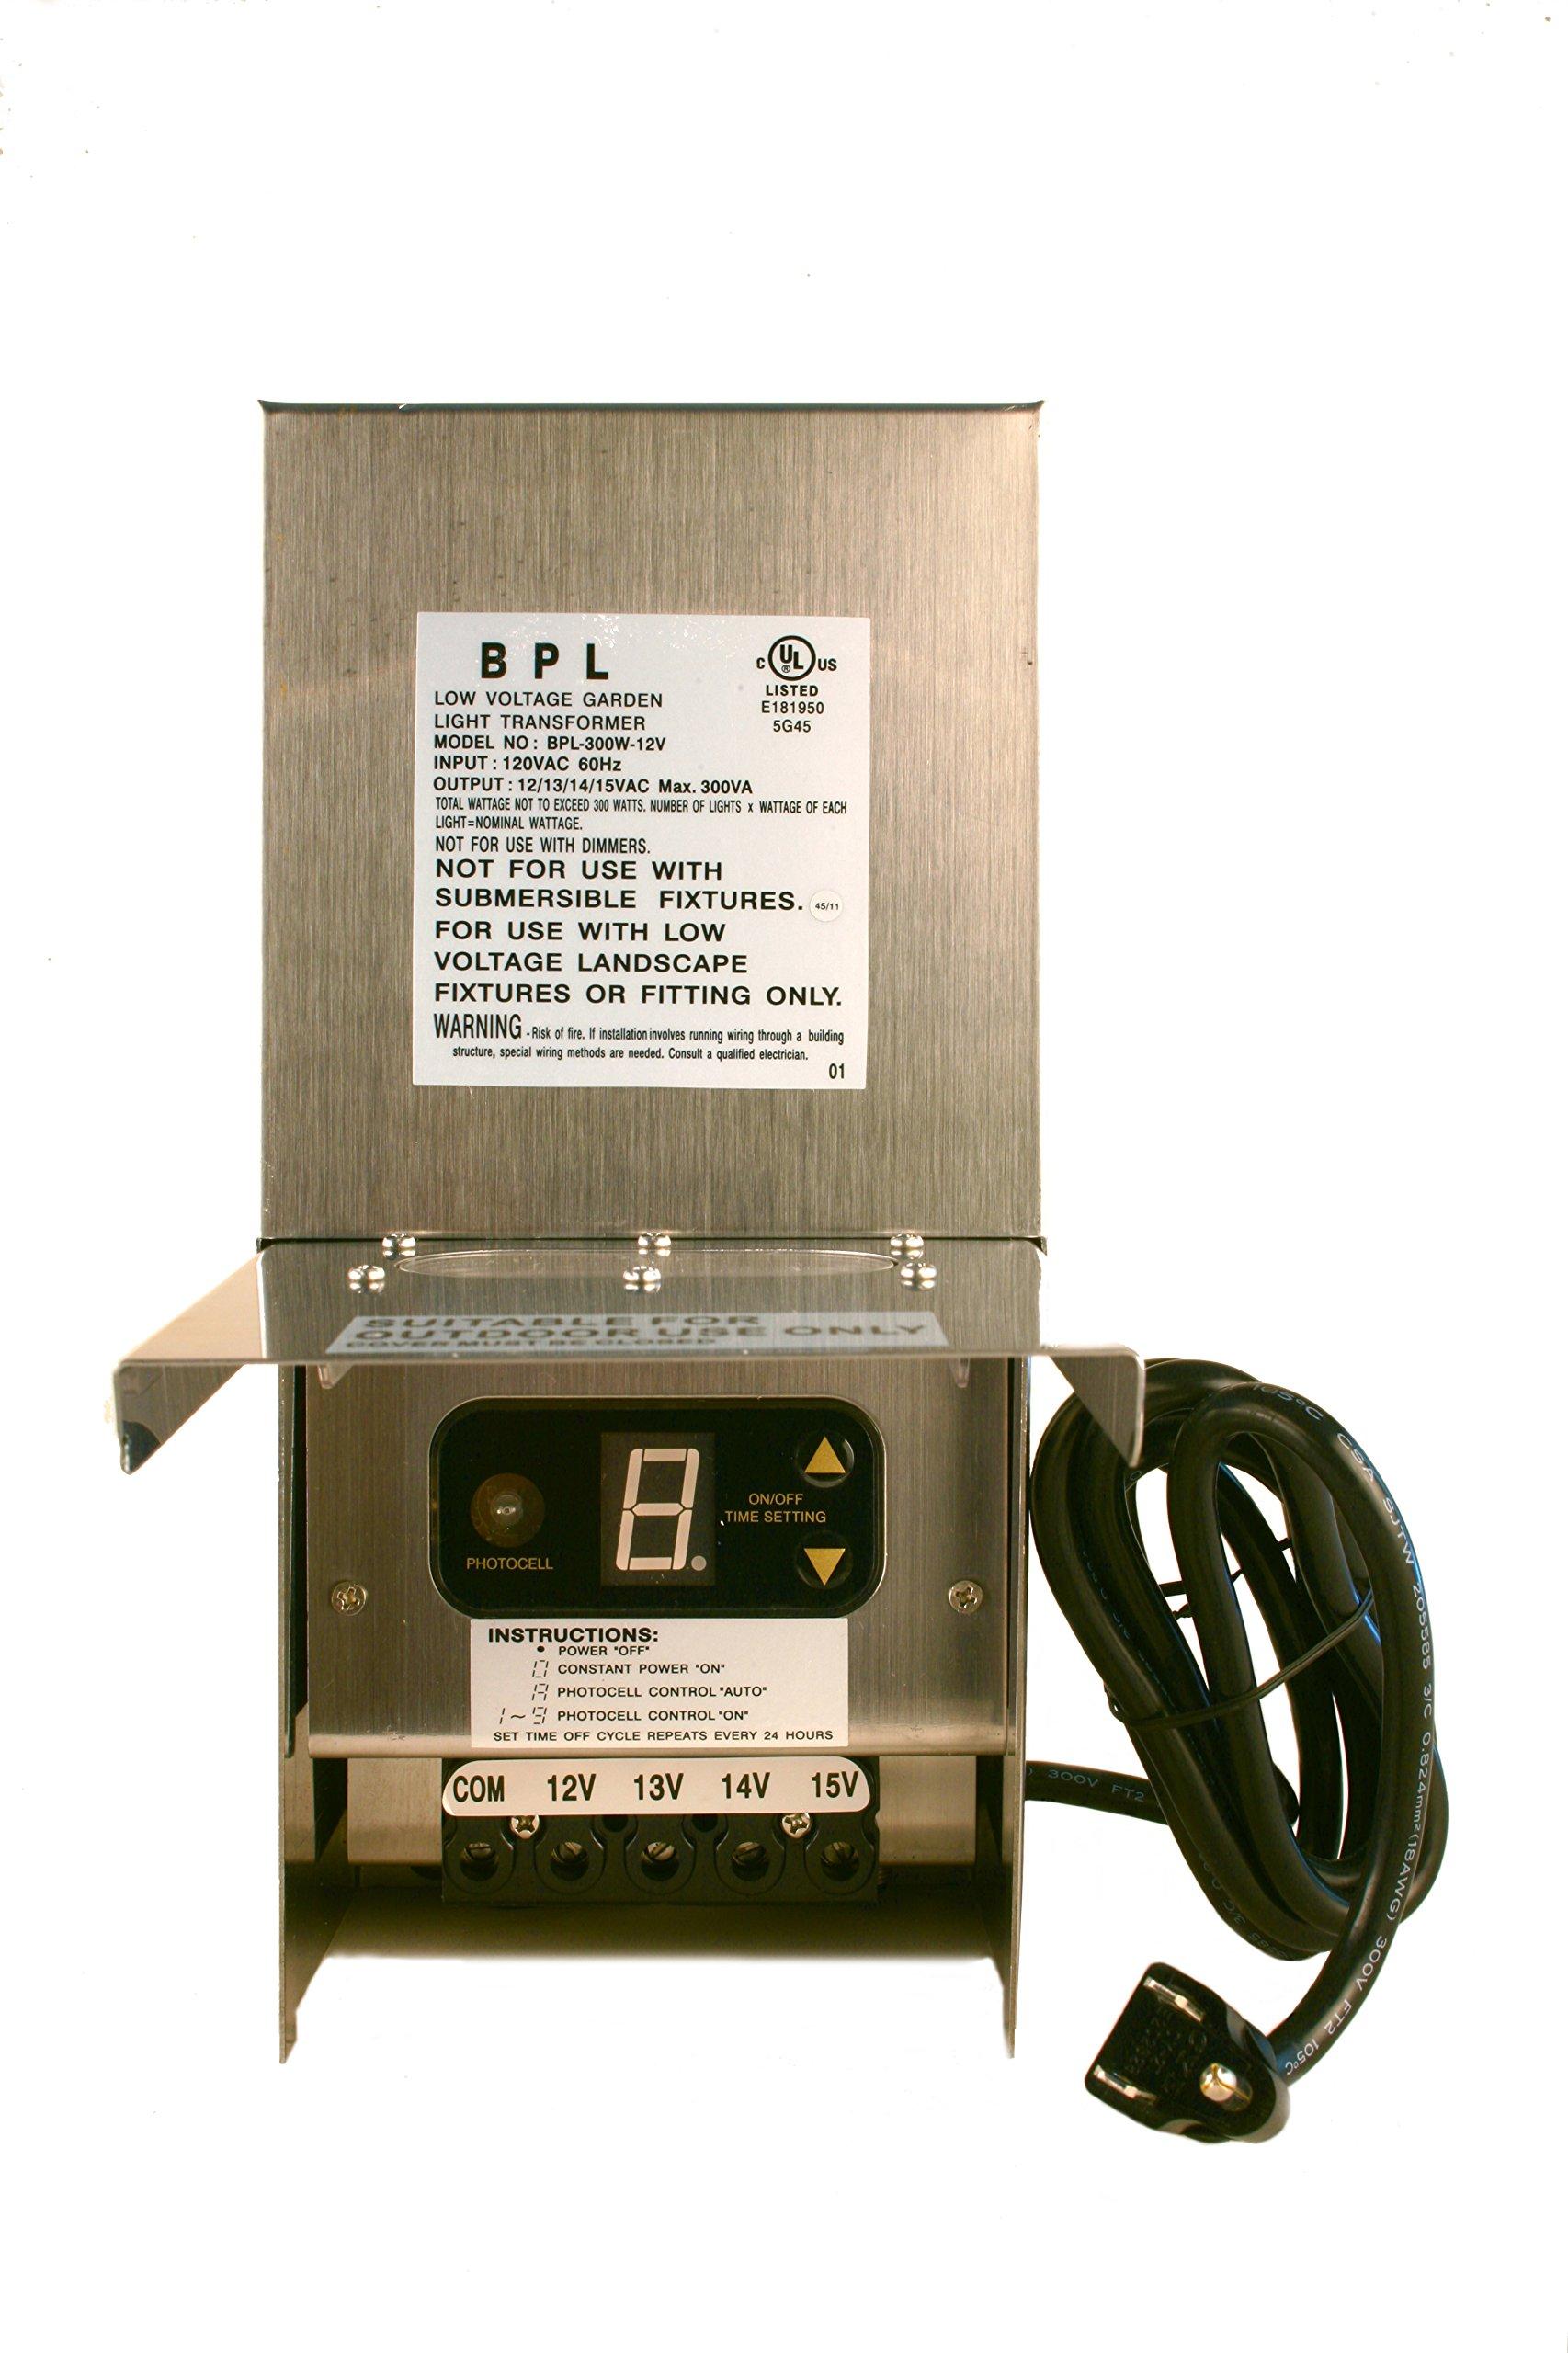 300W Stainless Steel with 12V-15V Multi Tap Landscape Lighting Transformer by Best Pro Lighting